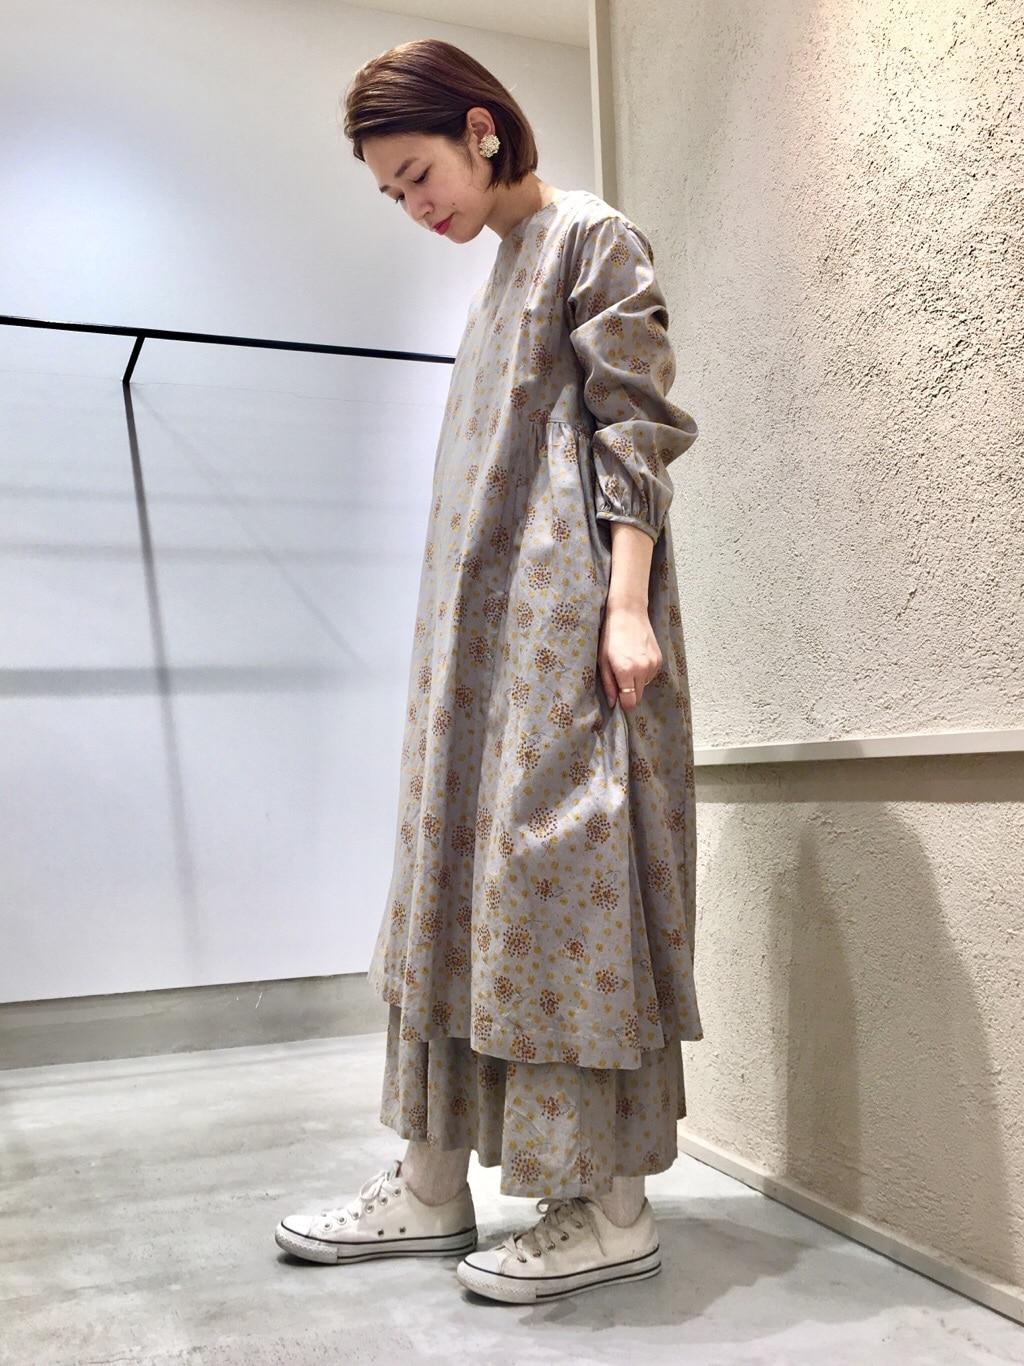 chambre de charme 横浜ジョイナス 身長:160cm 2020.12.28